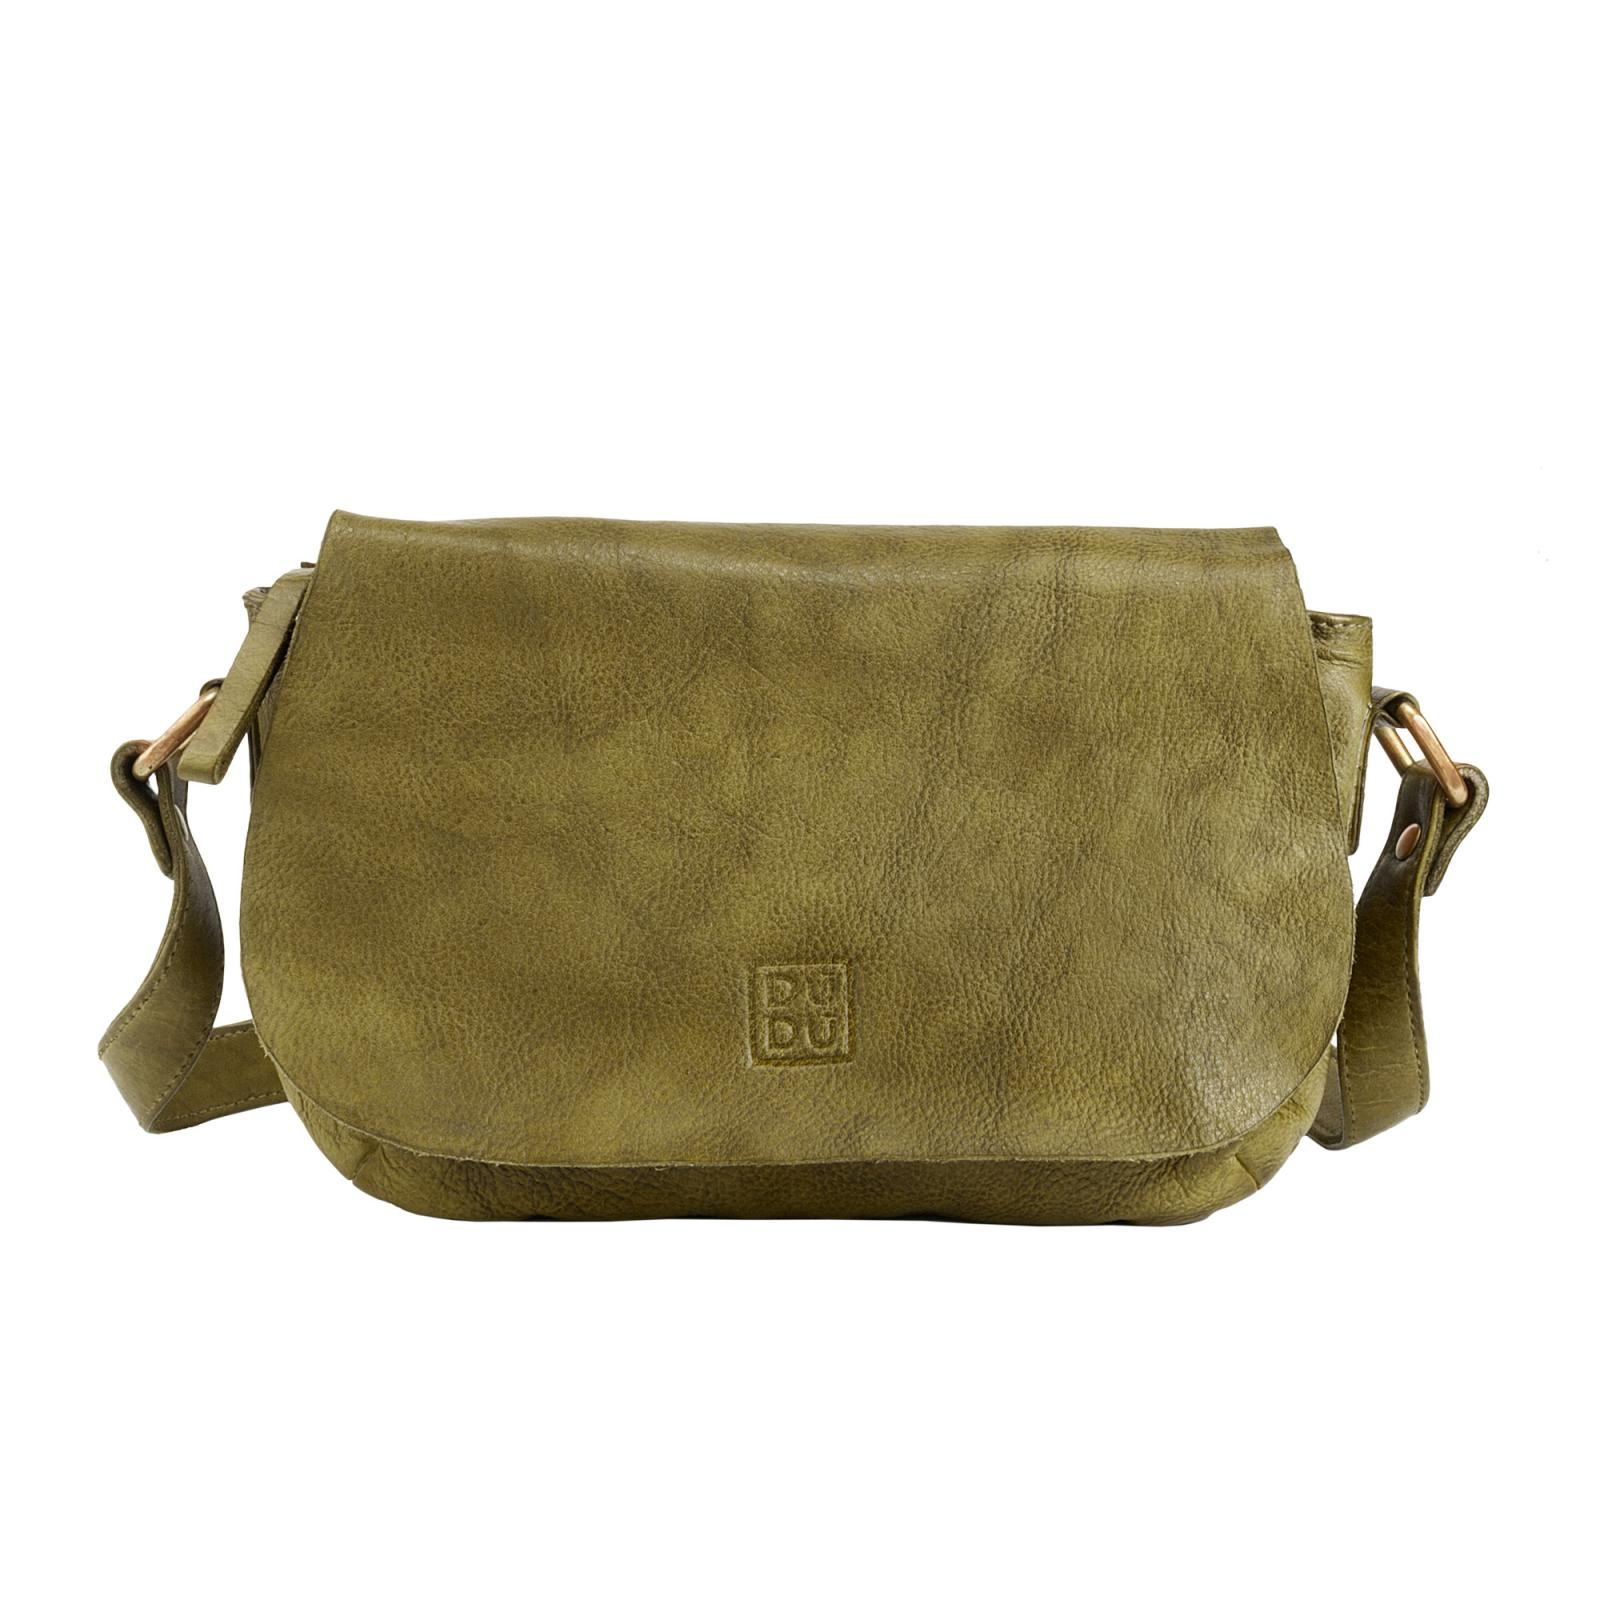 Borse  Donna  Timeless - Mini Bag  - Pistachio Green